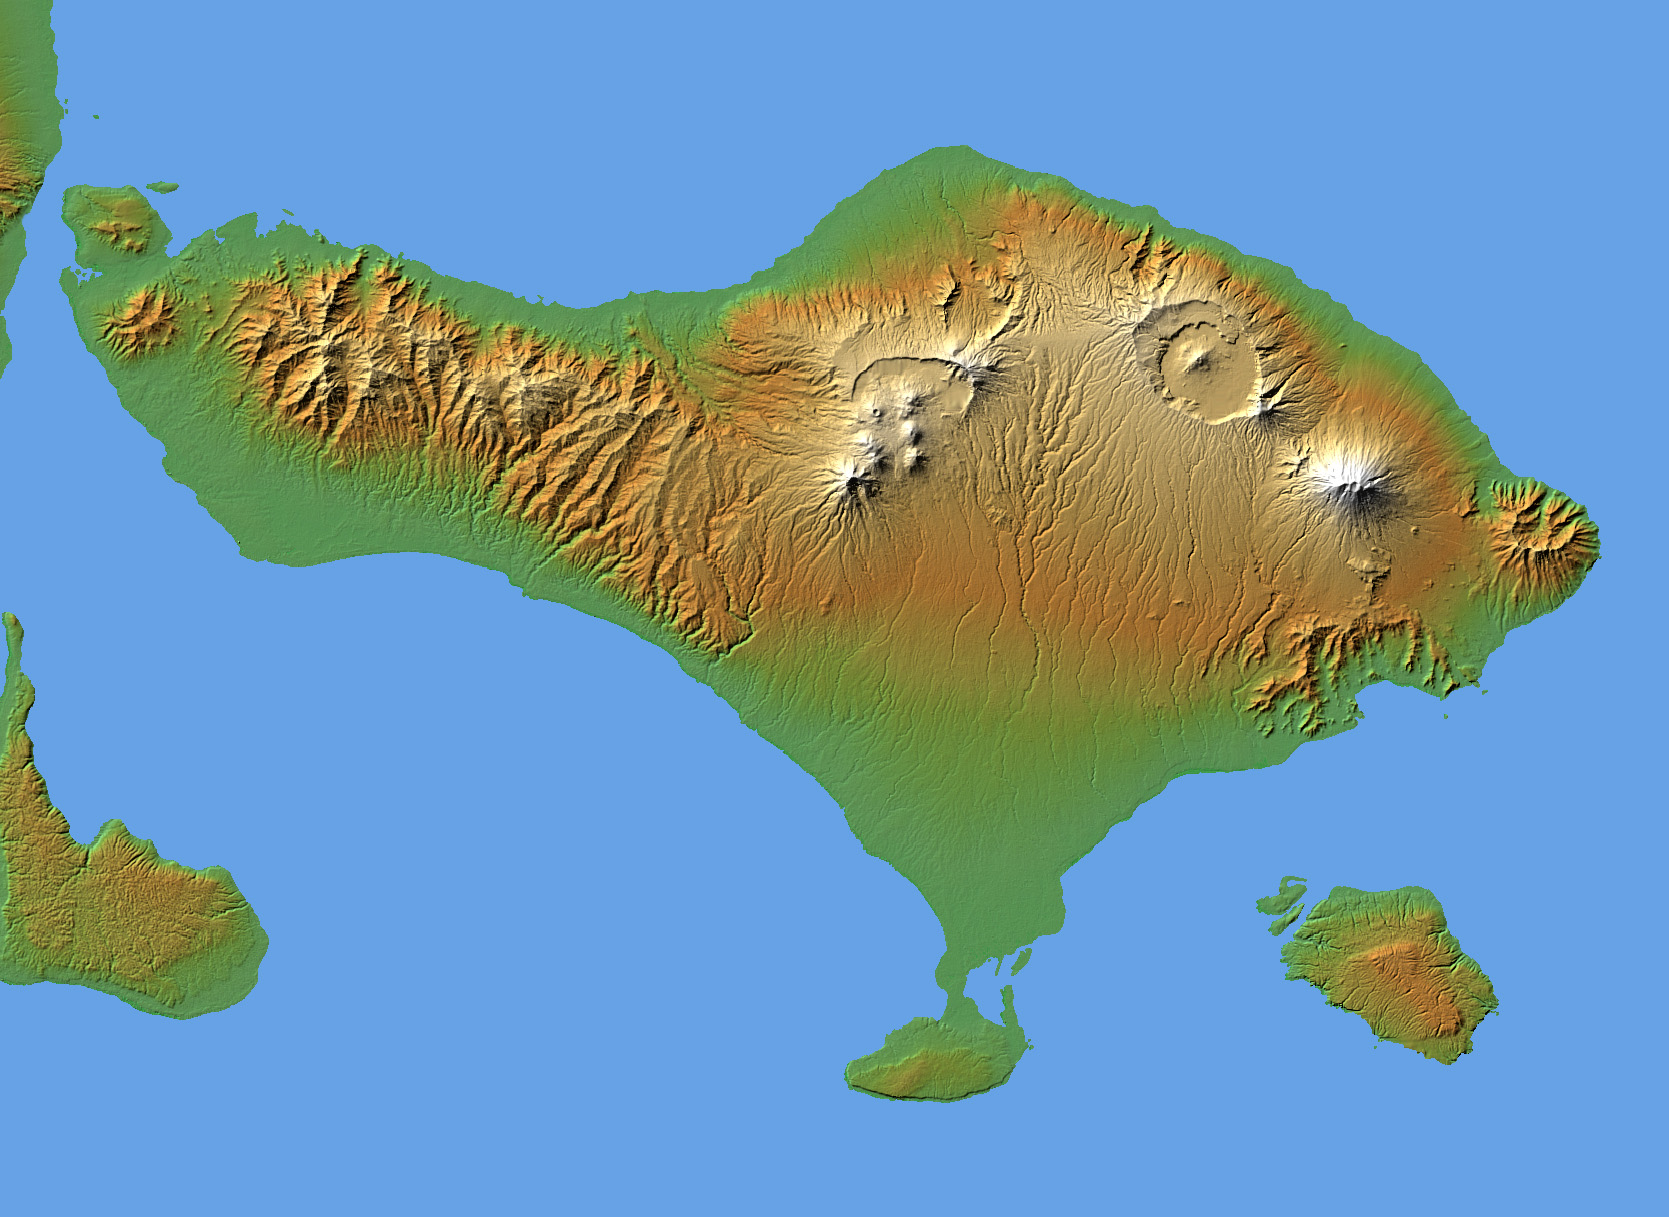 Topographic Image of Bali